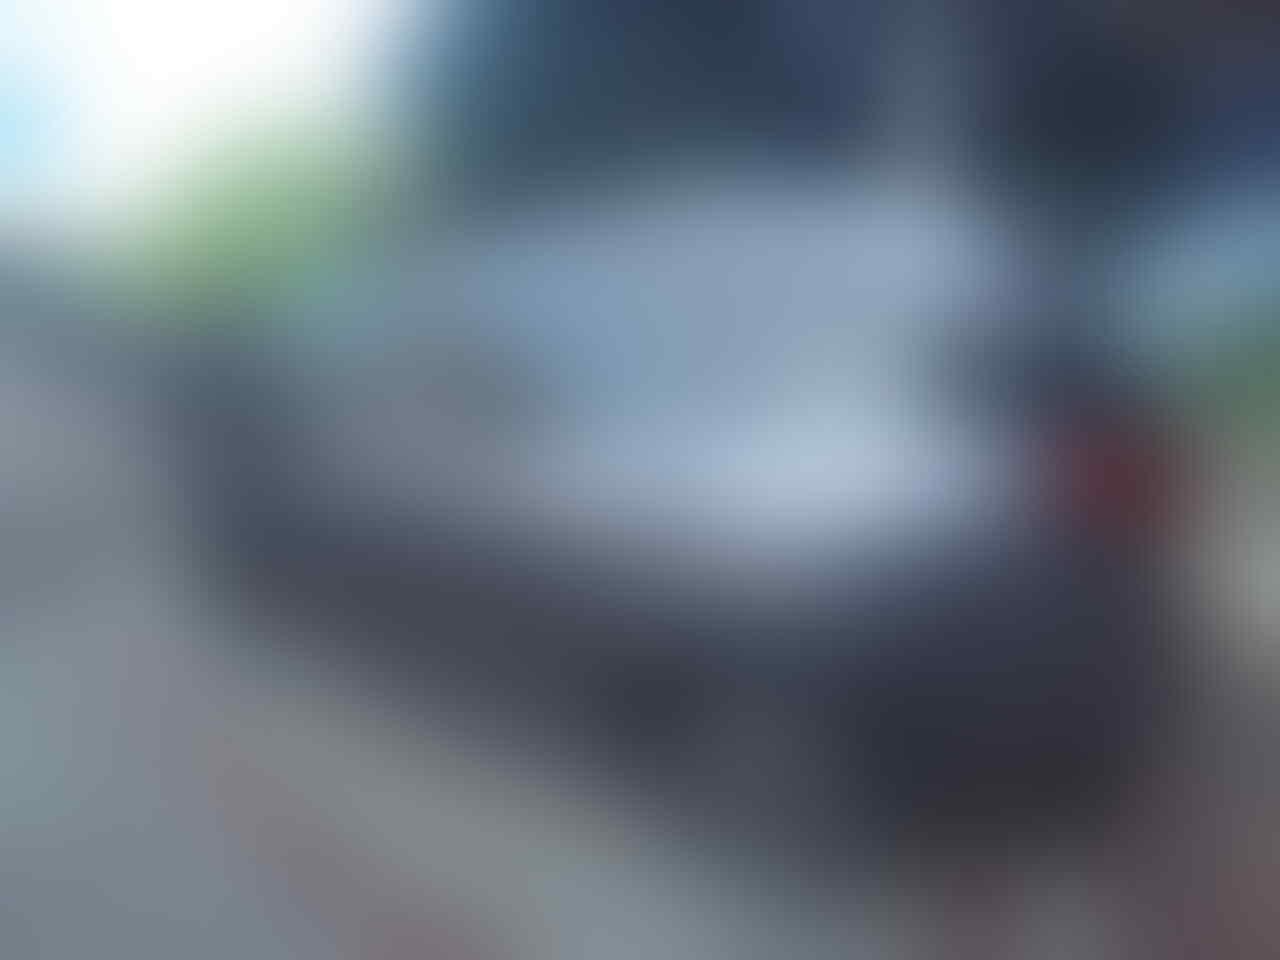 Kaca Film Spectrum, Heat Protection & 3M   Solusi Adem Buat Kendaraan Anda!!